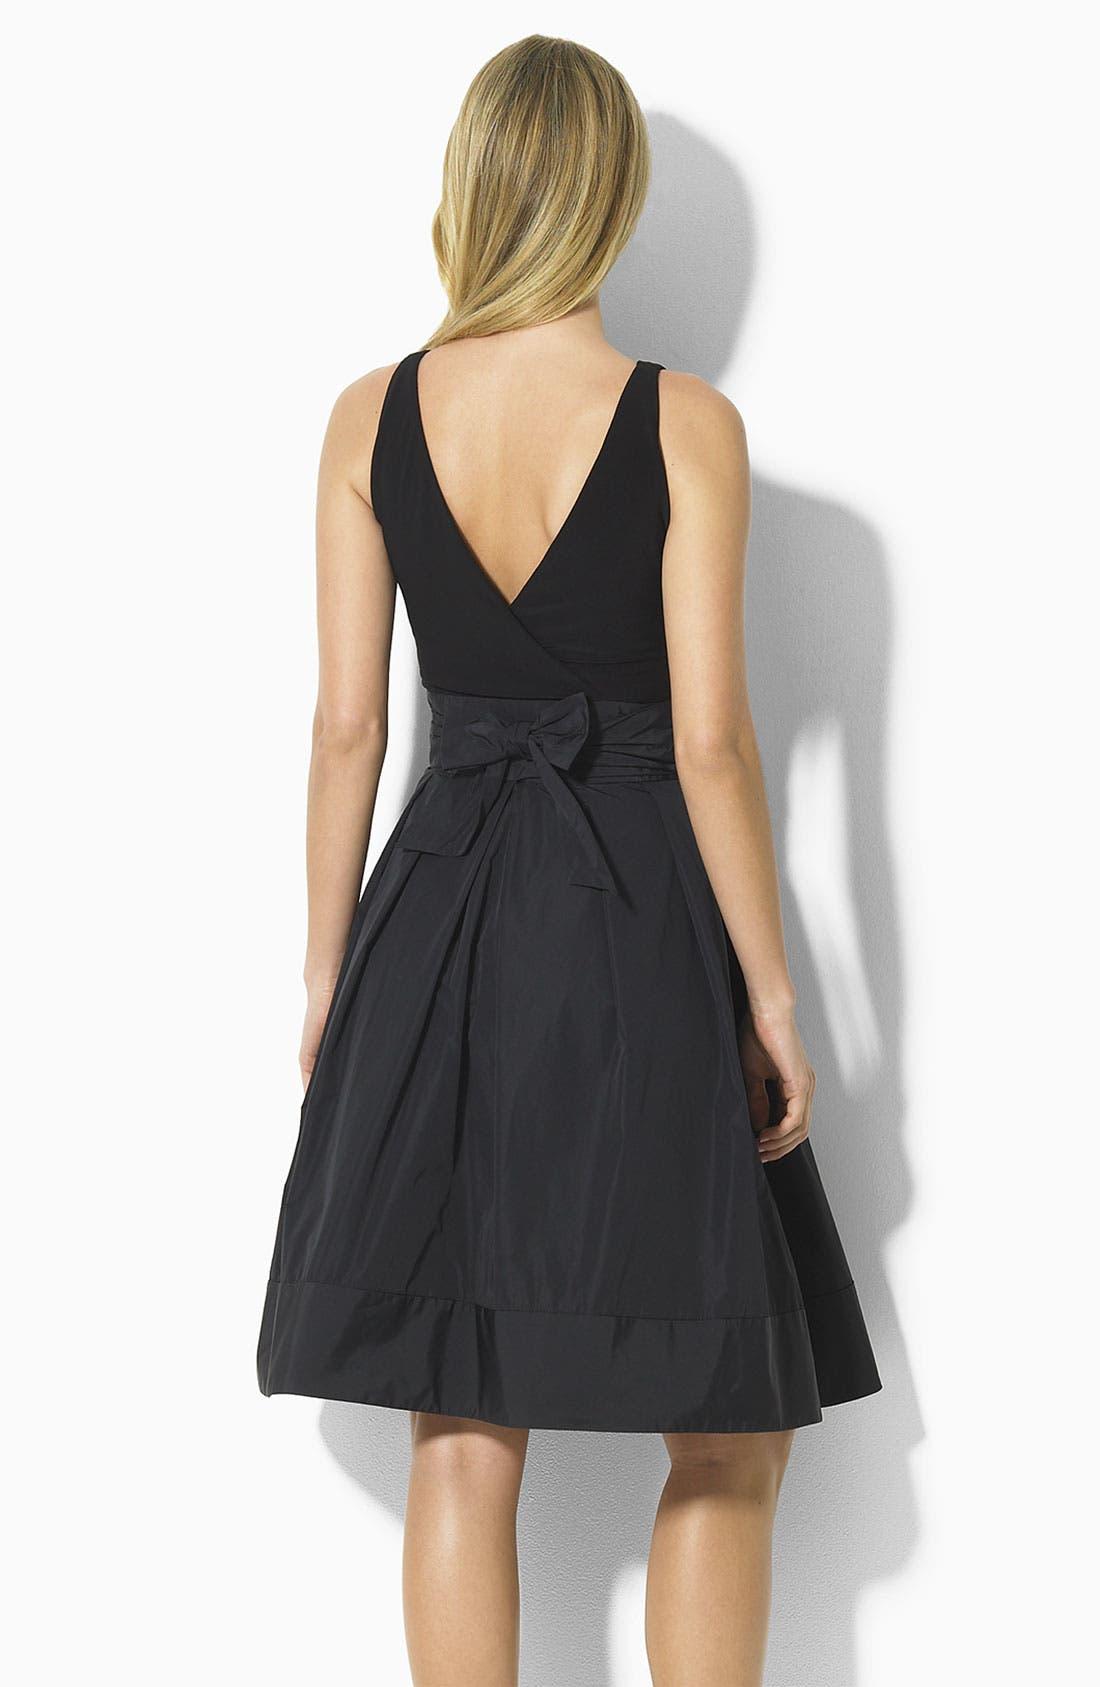 Lauren by Ralph Lauren 'Yuko' Jersey & Taffeta Dress,                             Alternate thumbnail 2, color,                             001